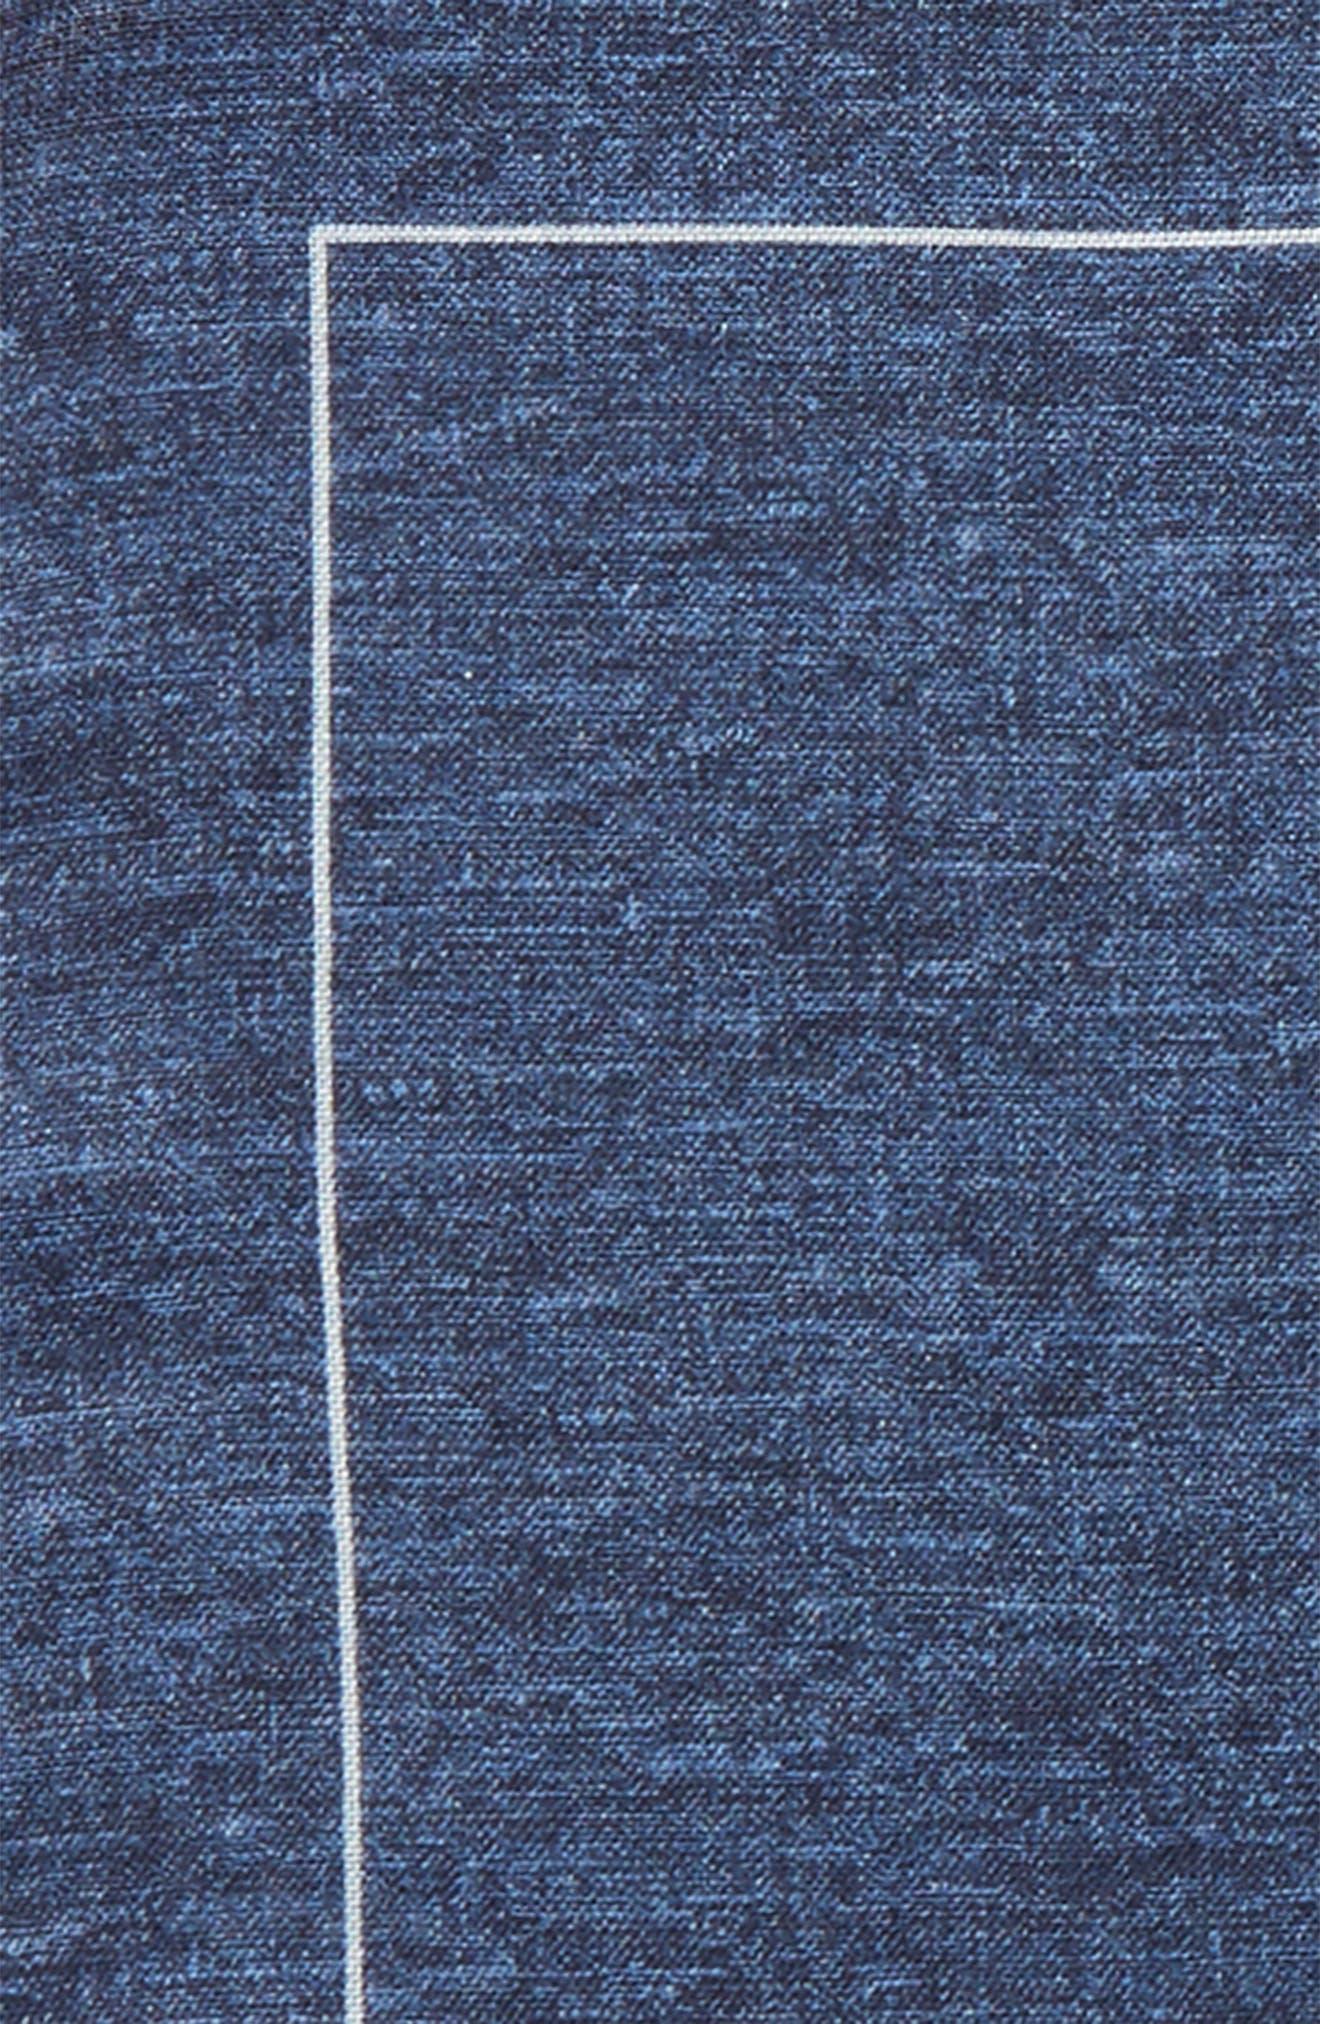 Denim Print Silk Pocket Square,                             Alternate thumbnail 3, color,                             Denim